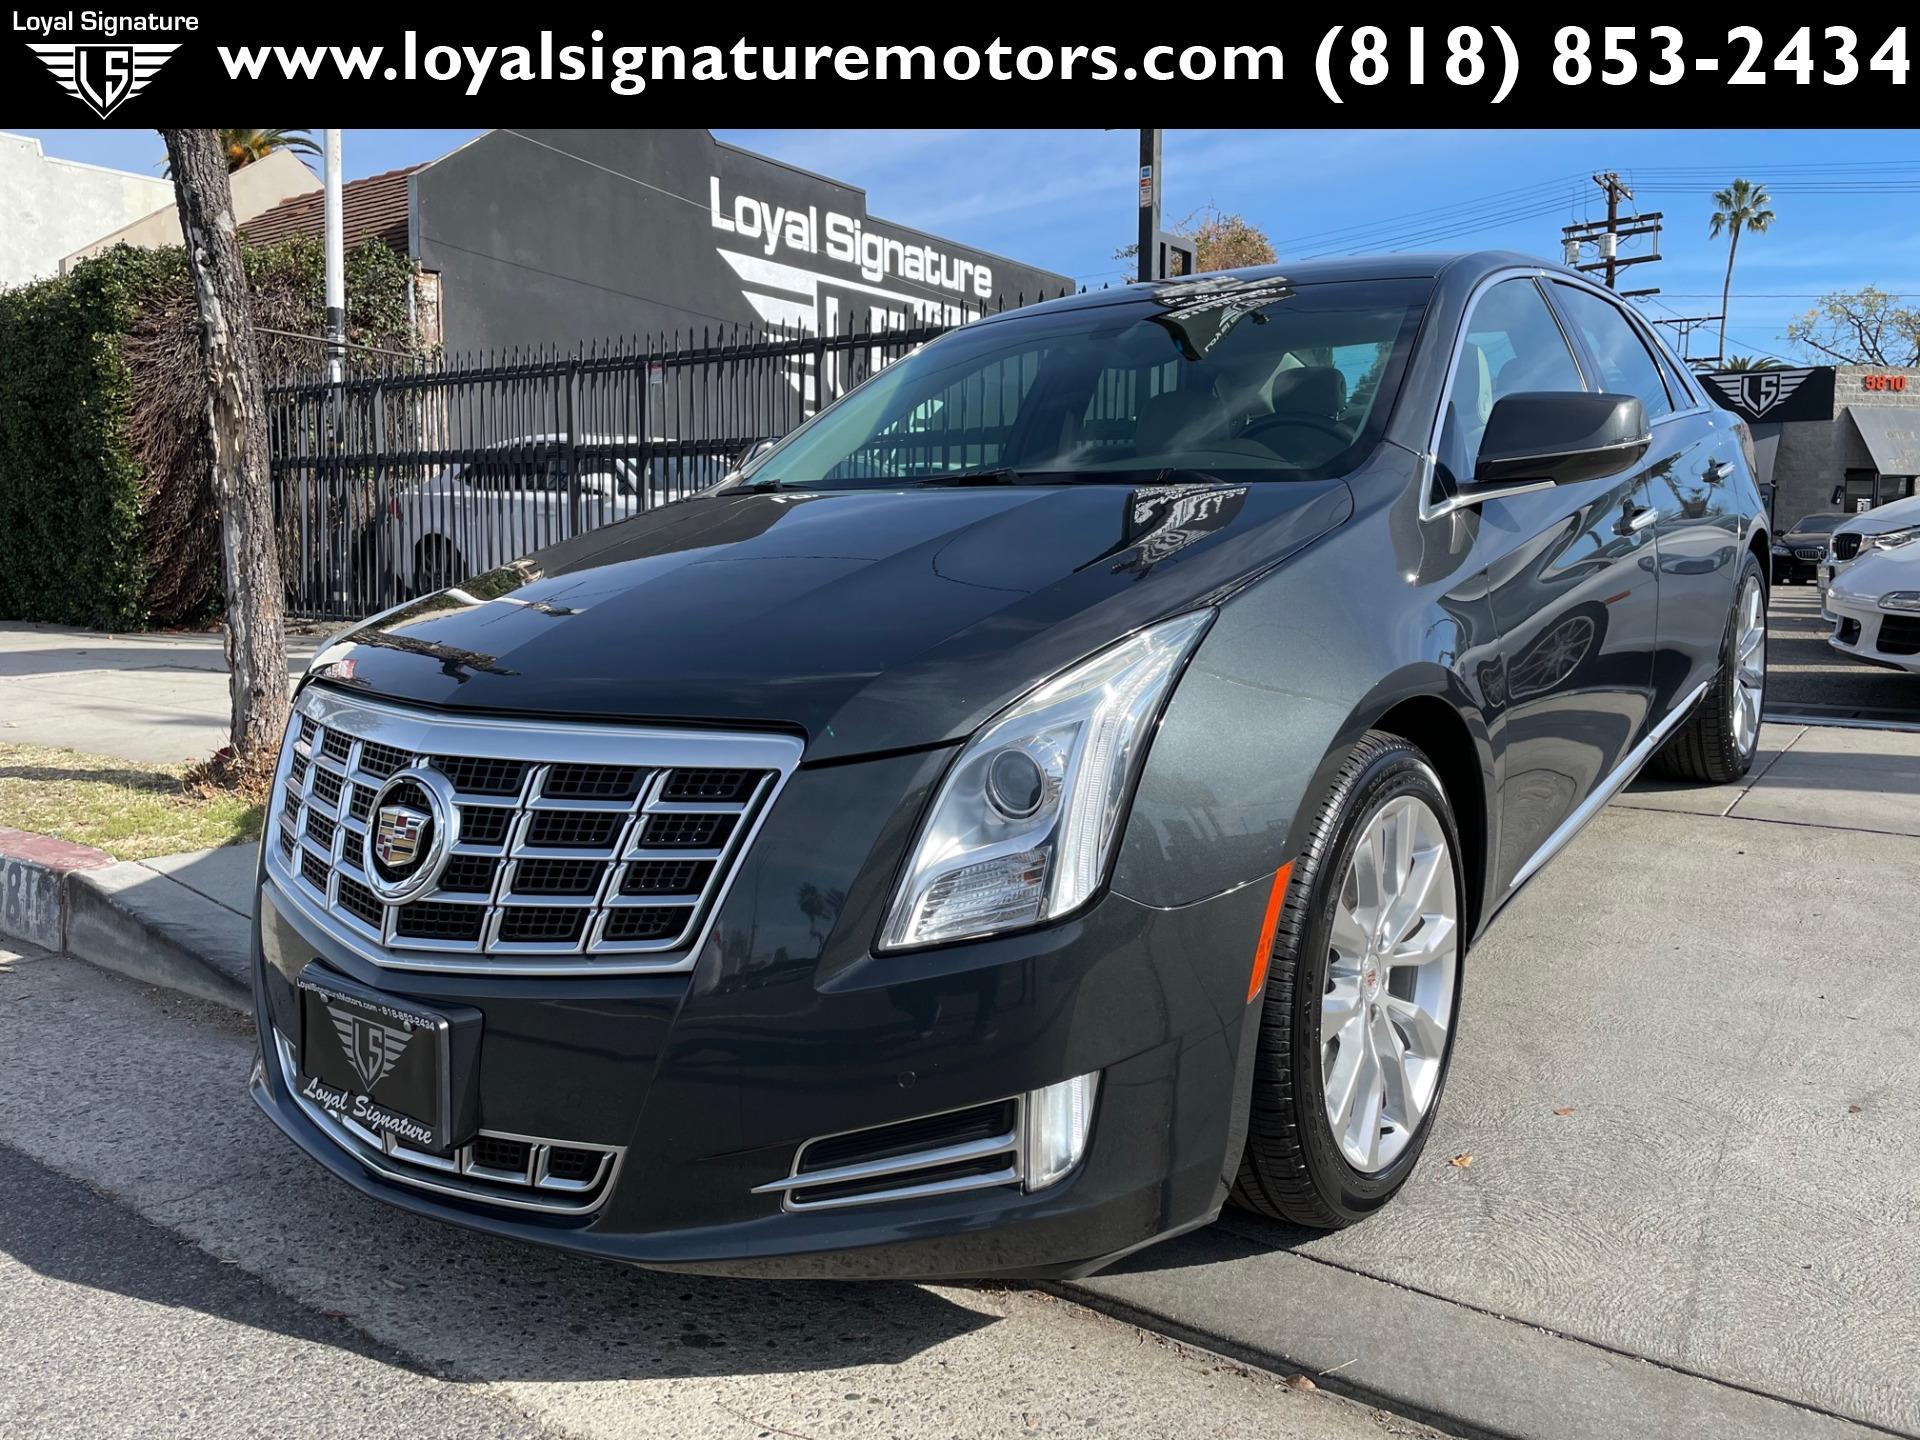 Used-2015-Cadillac-XTS-Luxury